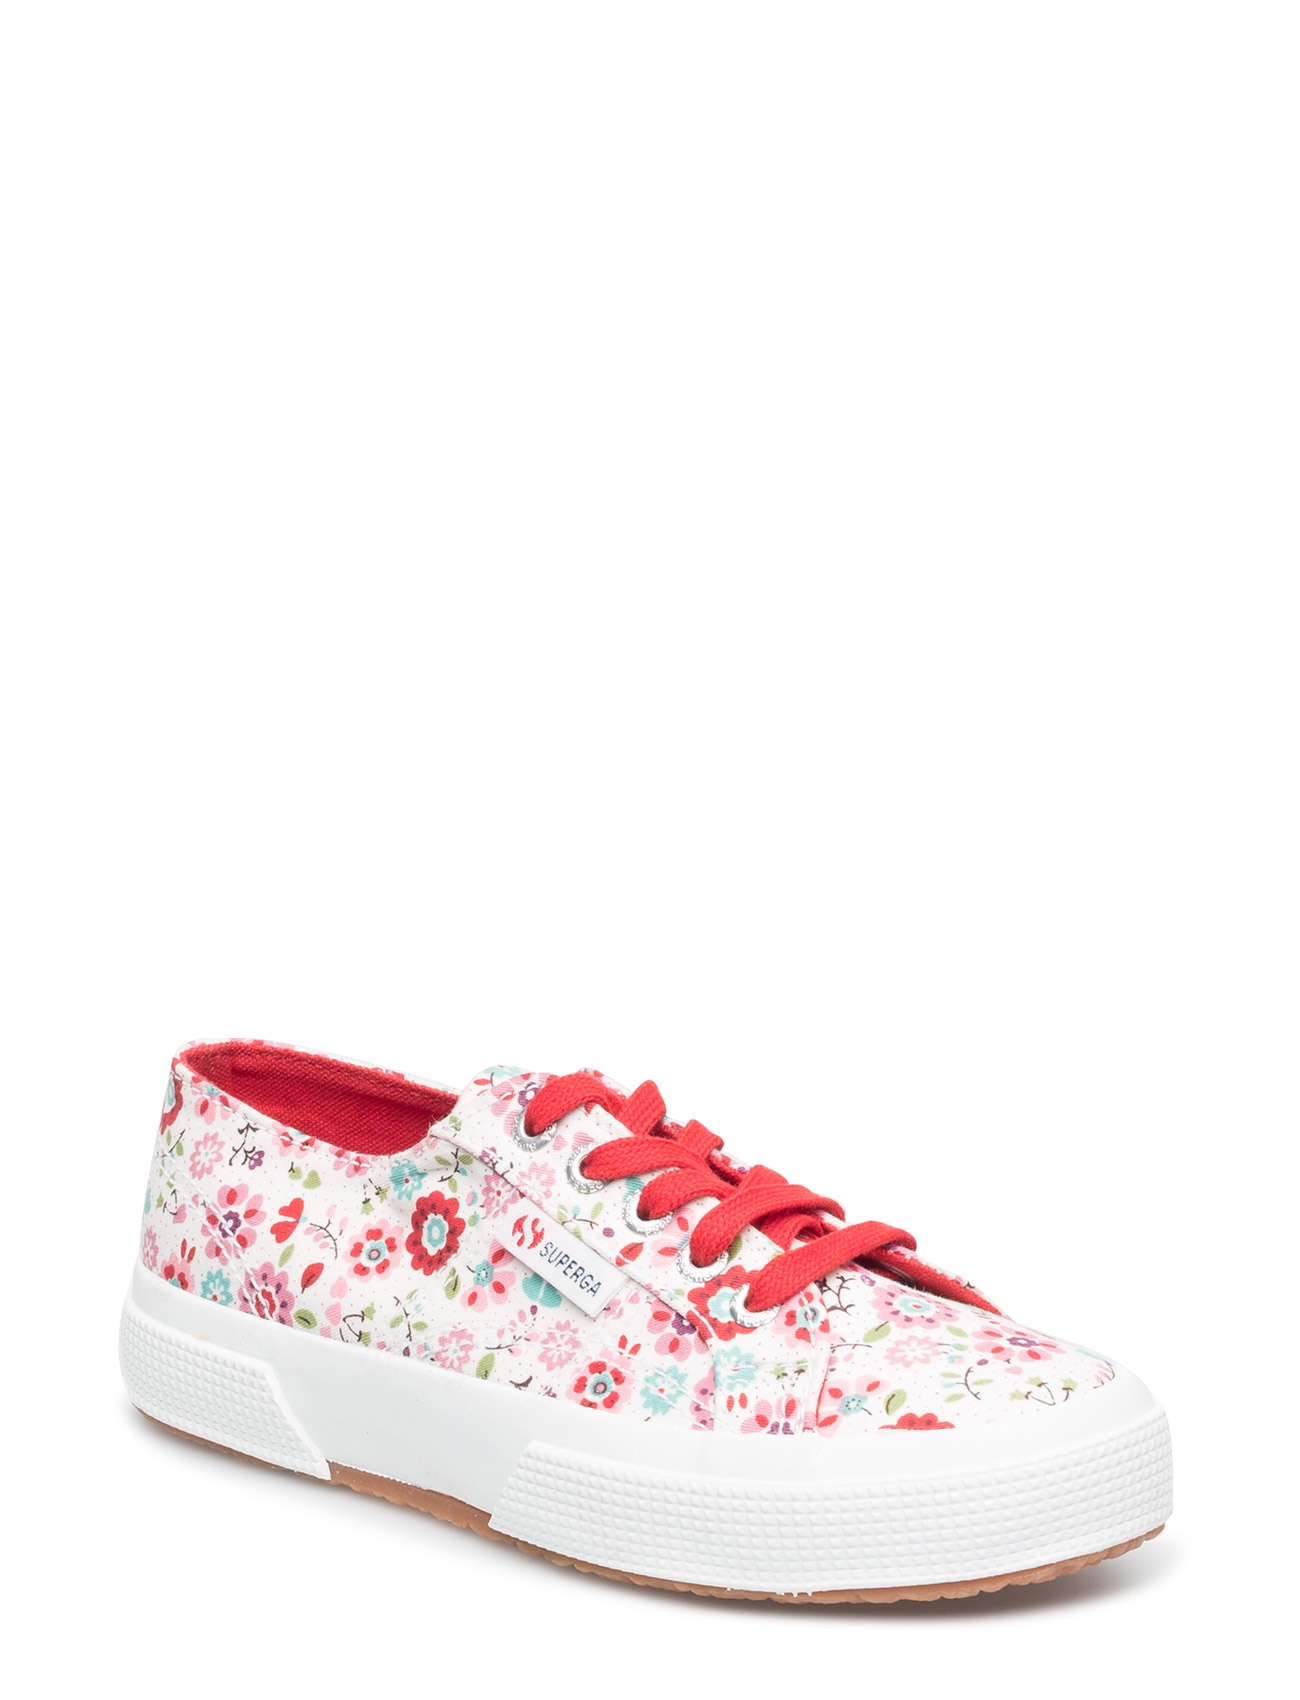 Superga 2750 Cotflowersj Flowers Superga Sko & Sneakers til Børn i Blu